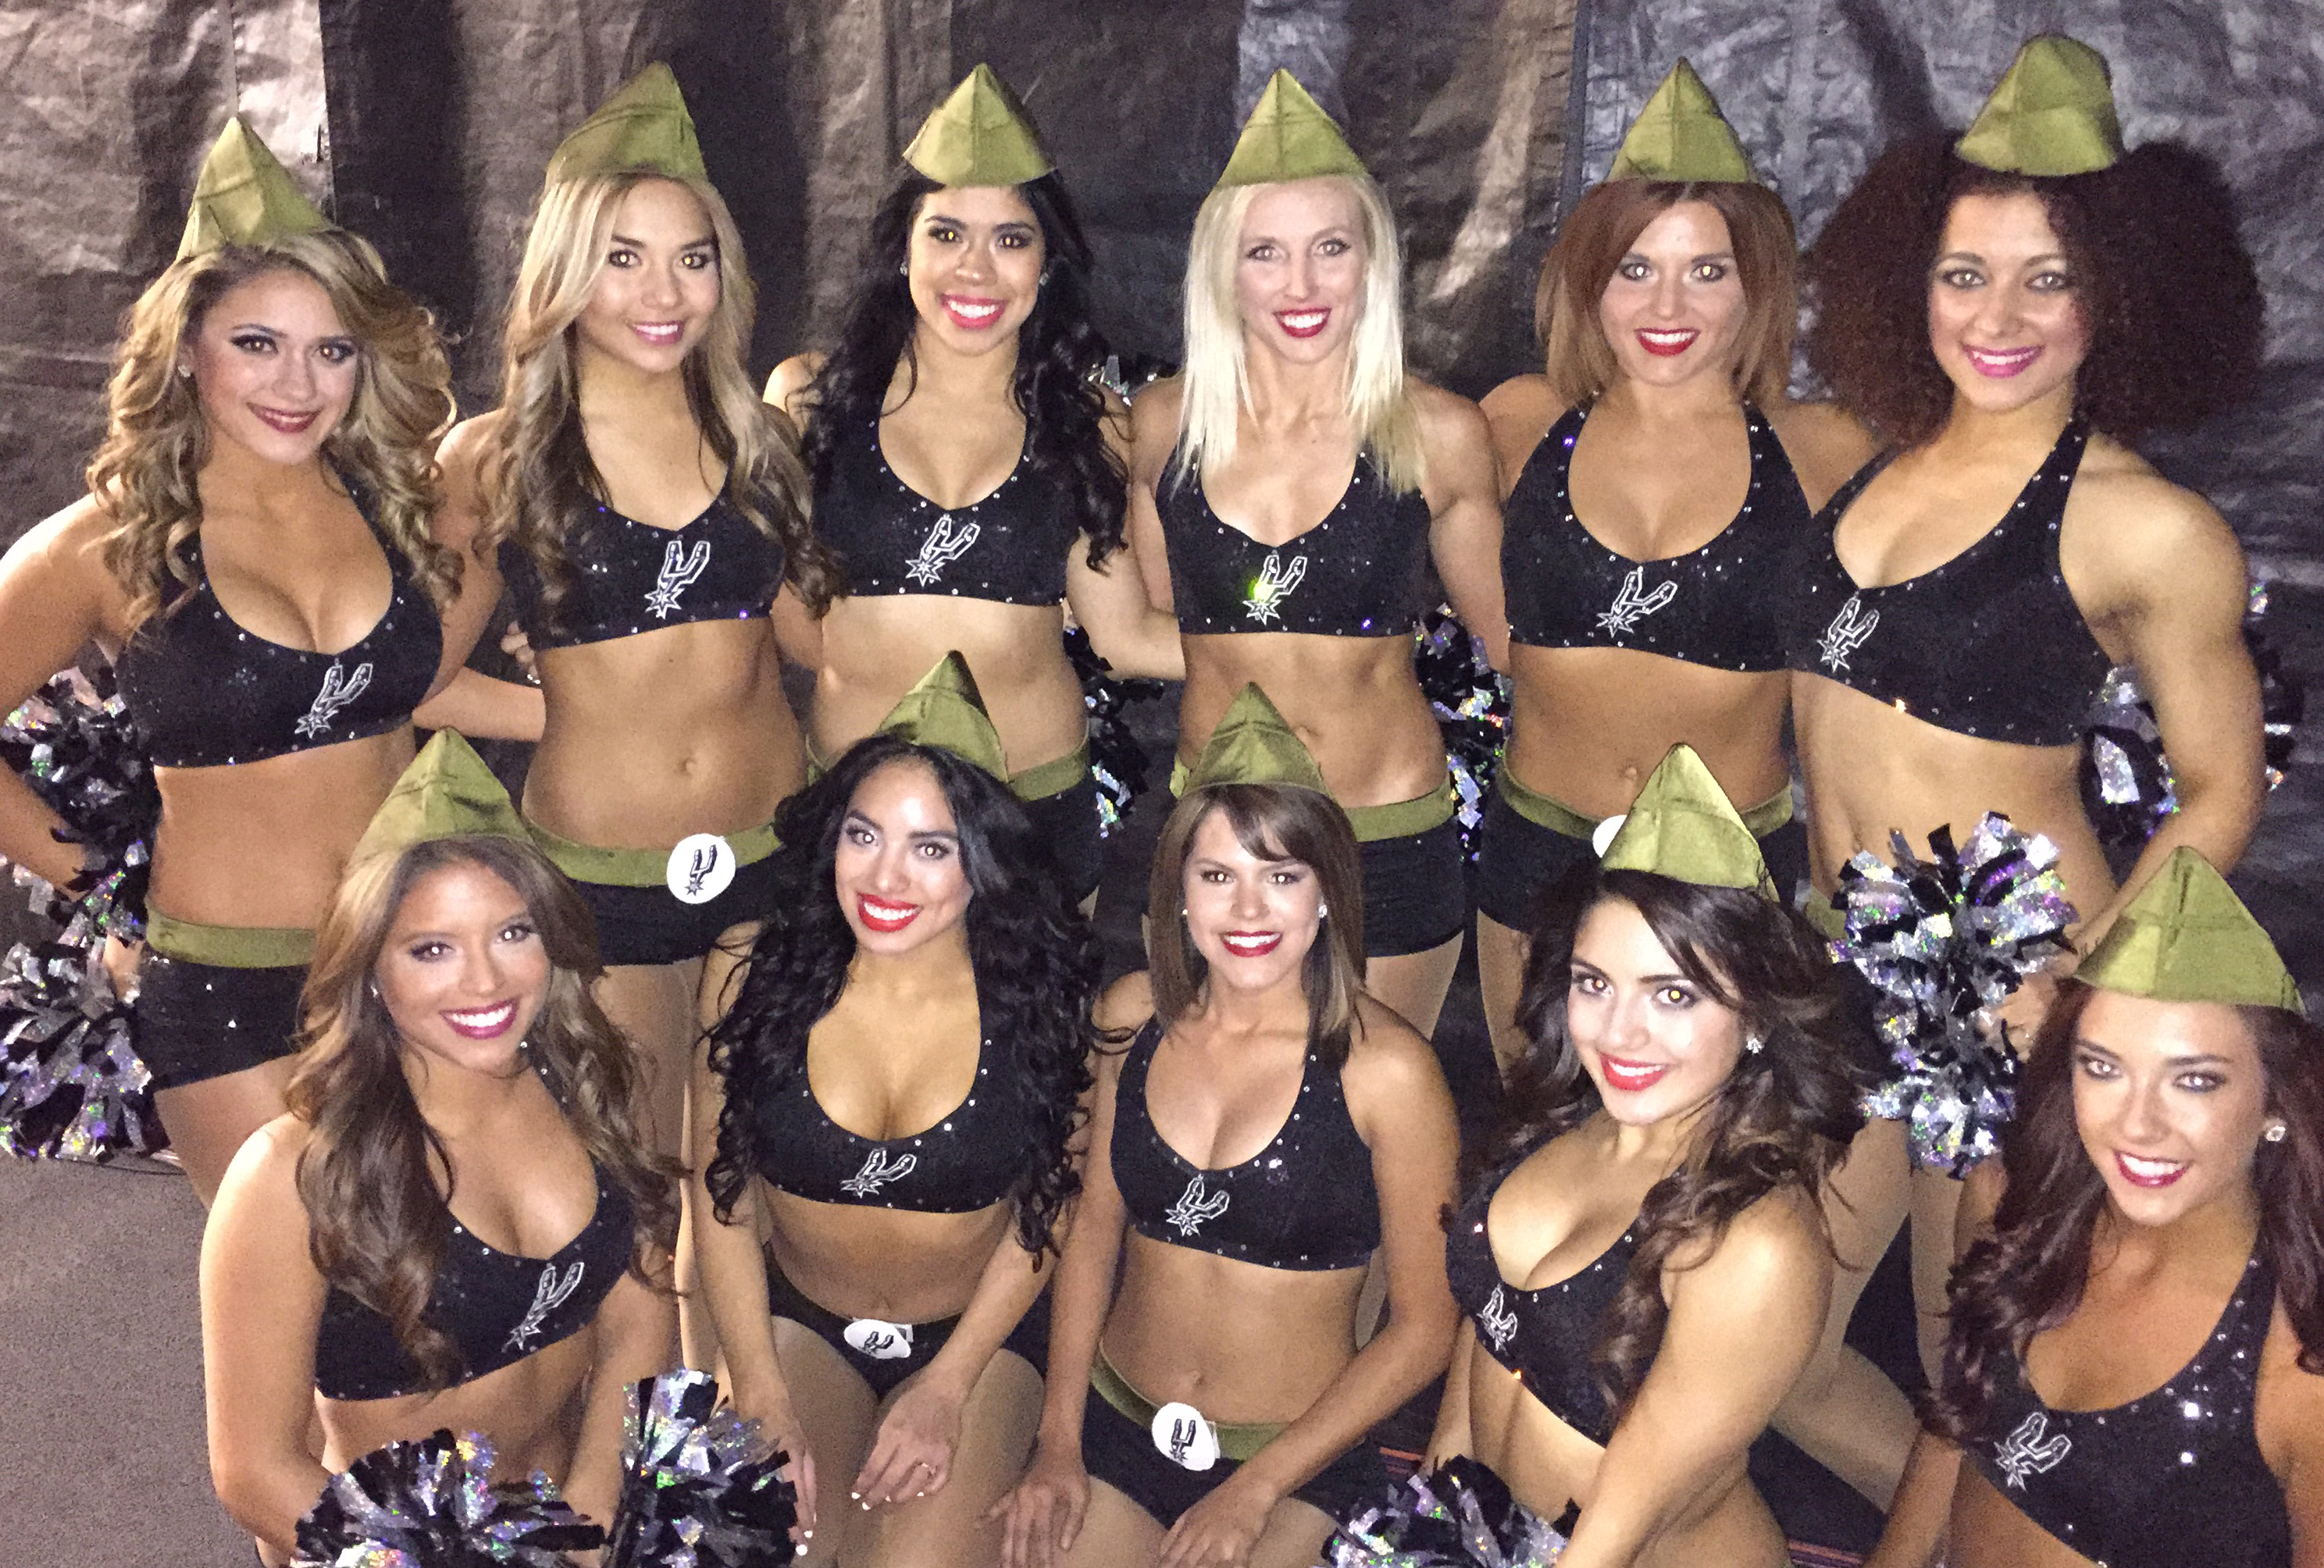 San Antonio Spurs Silver Dancers Military dance costume